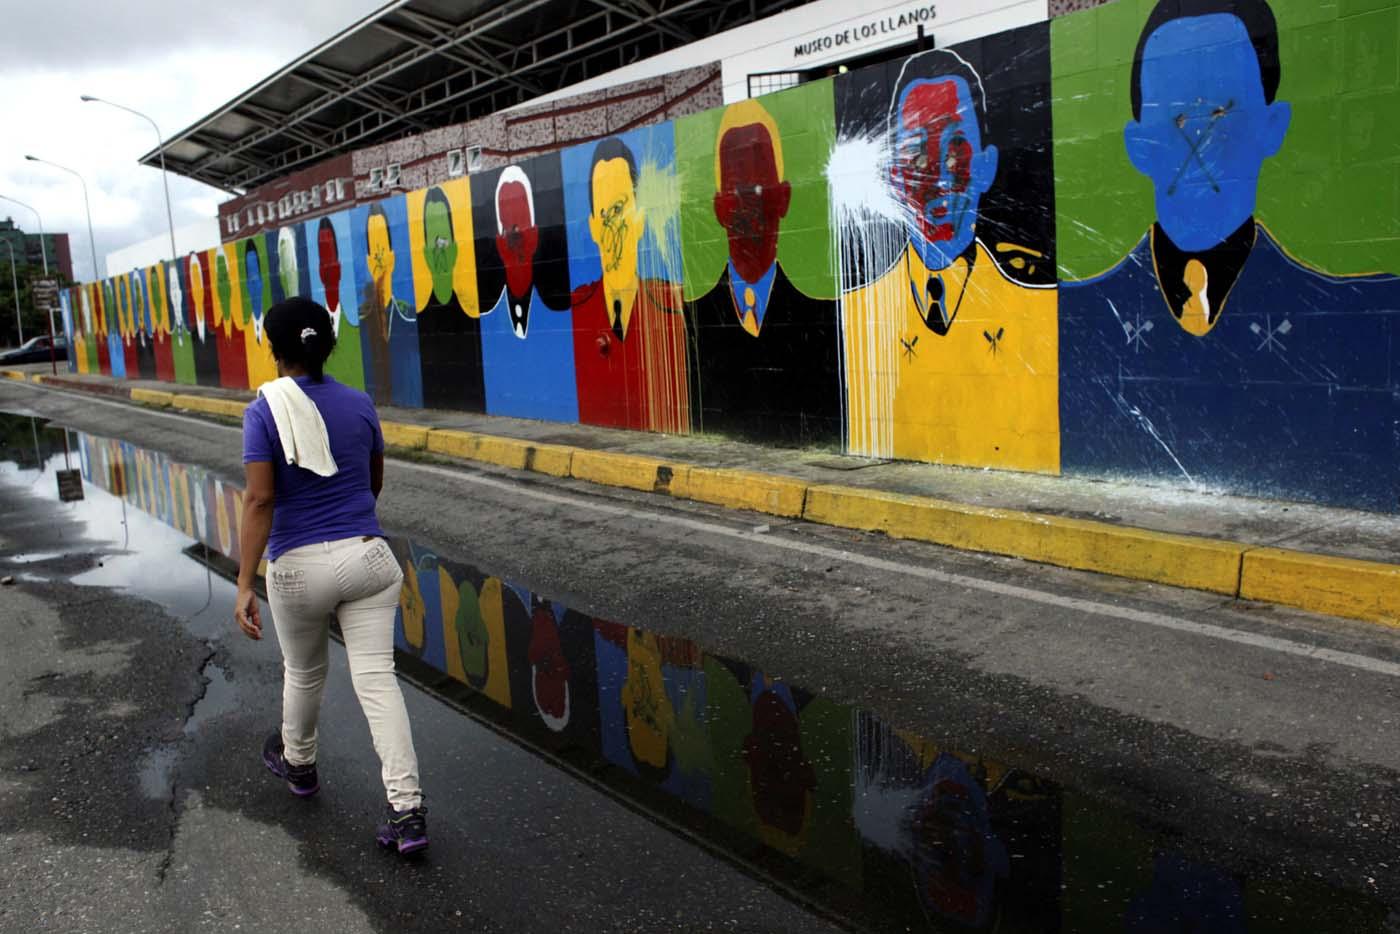 A woman walks next to a mural depicting Venezuela's late President Hugo Chavez in Barinas, Venezuela June 14, 2017. Picture taken June 14, 2017. REUTERS/Carlos Eduardo Ramirez